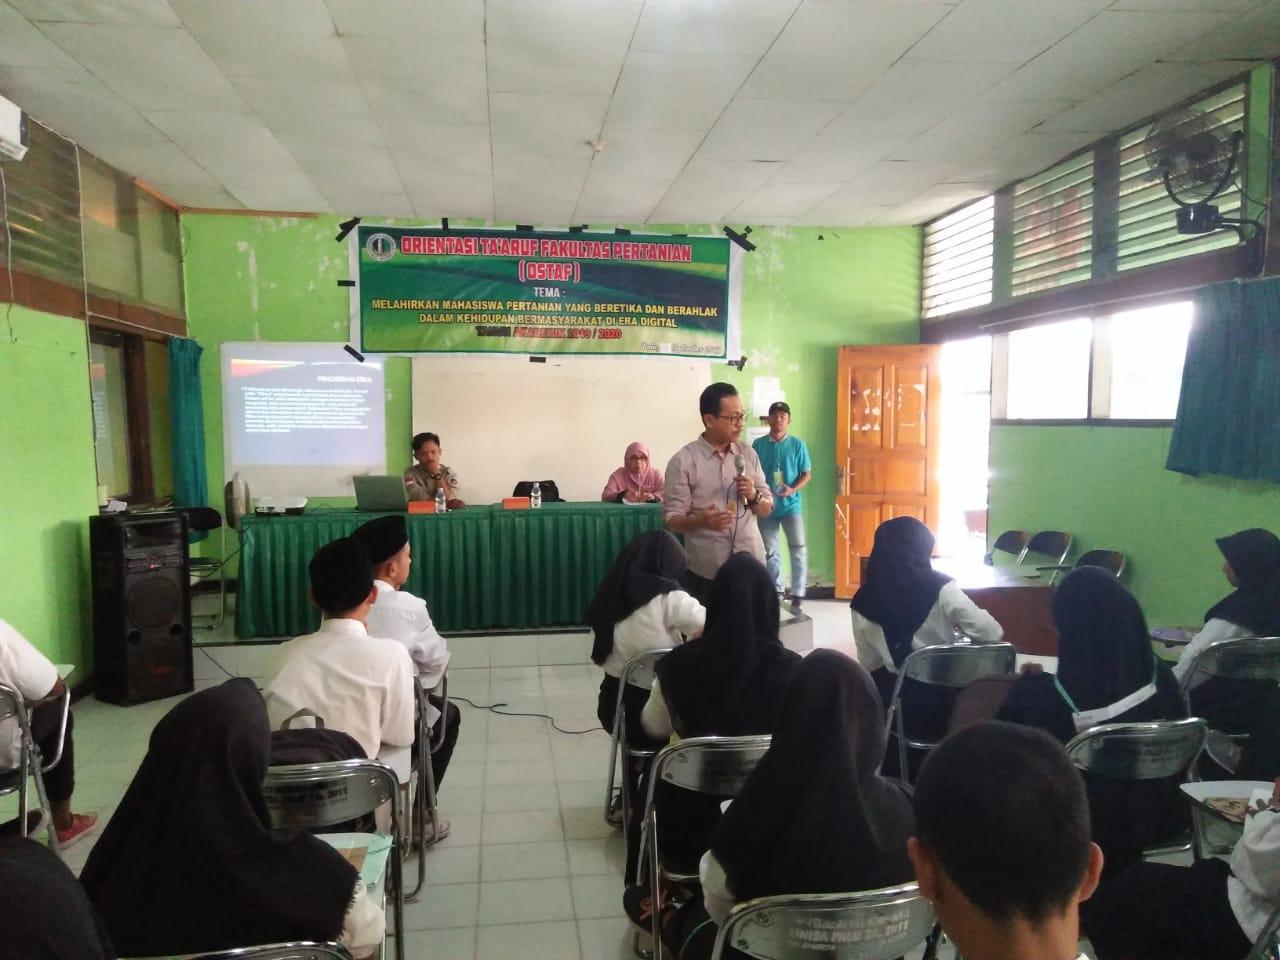 Fakultas Pertanian Unisa Gelar Orientasi Studi Taaruf Fakultas (OSTAF)